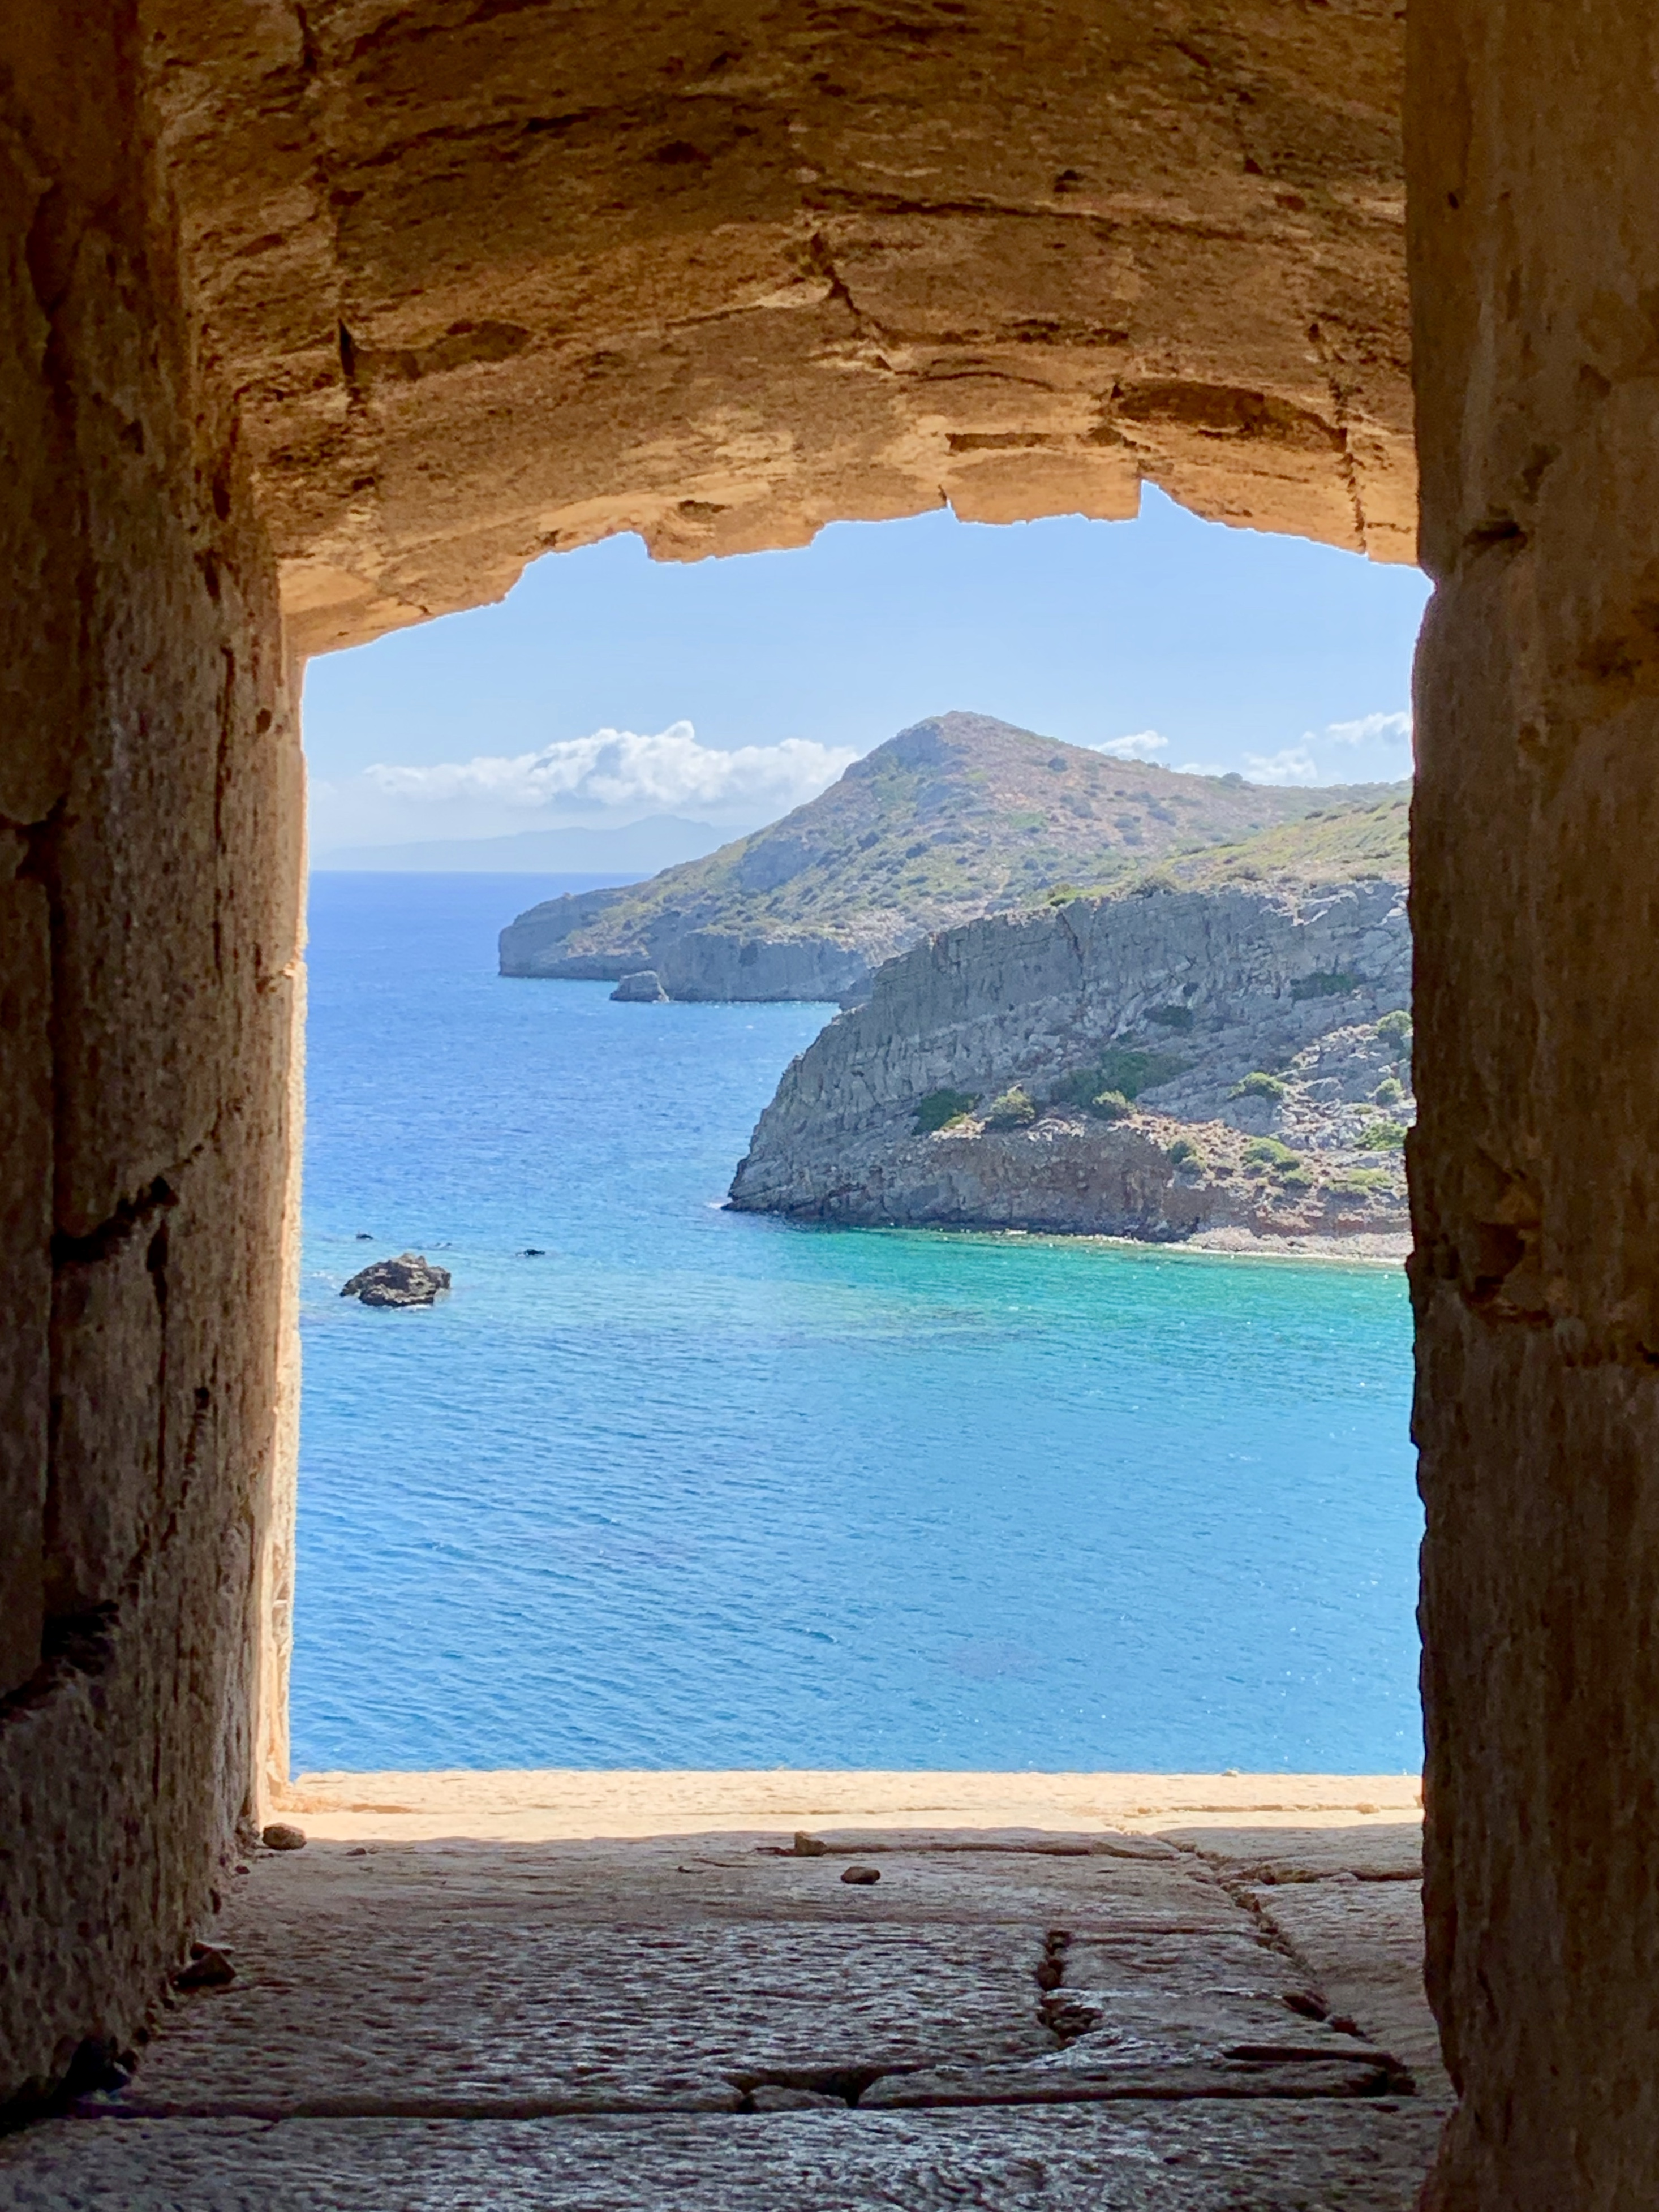 10 Days in Greece-Athens, Crete, Santorini-For the Adventurer!